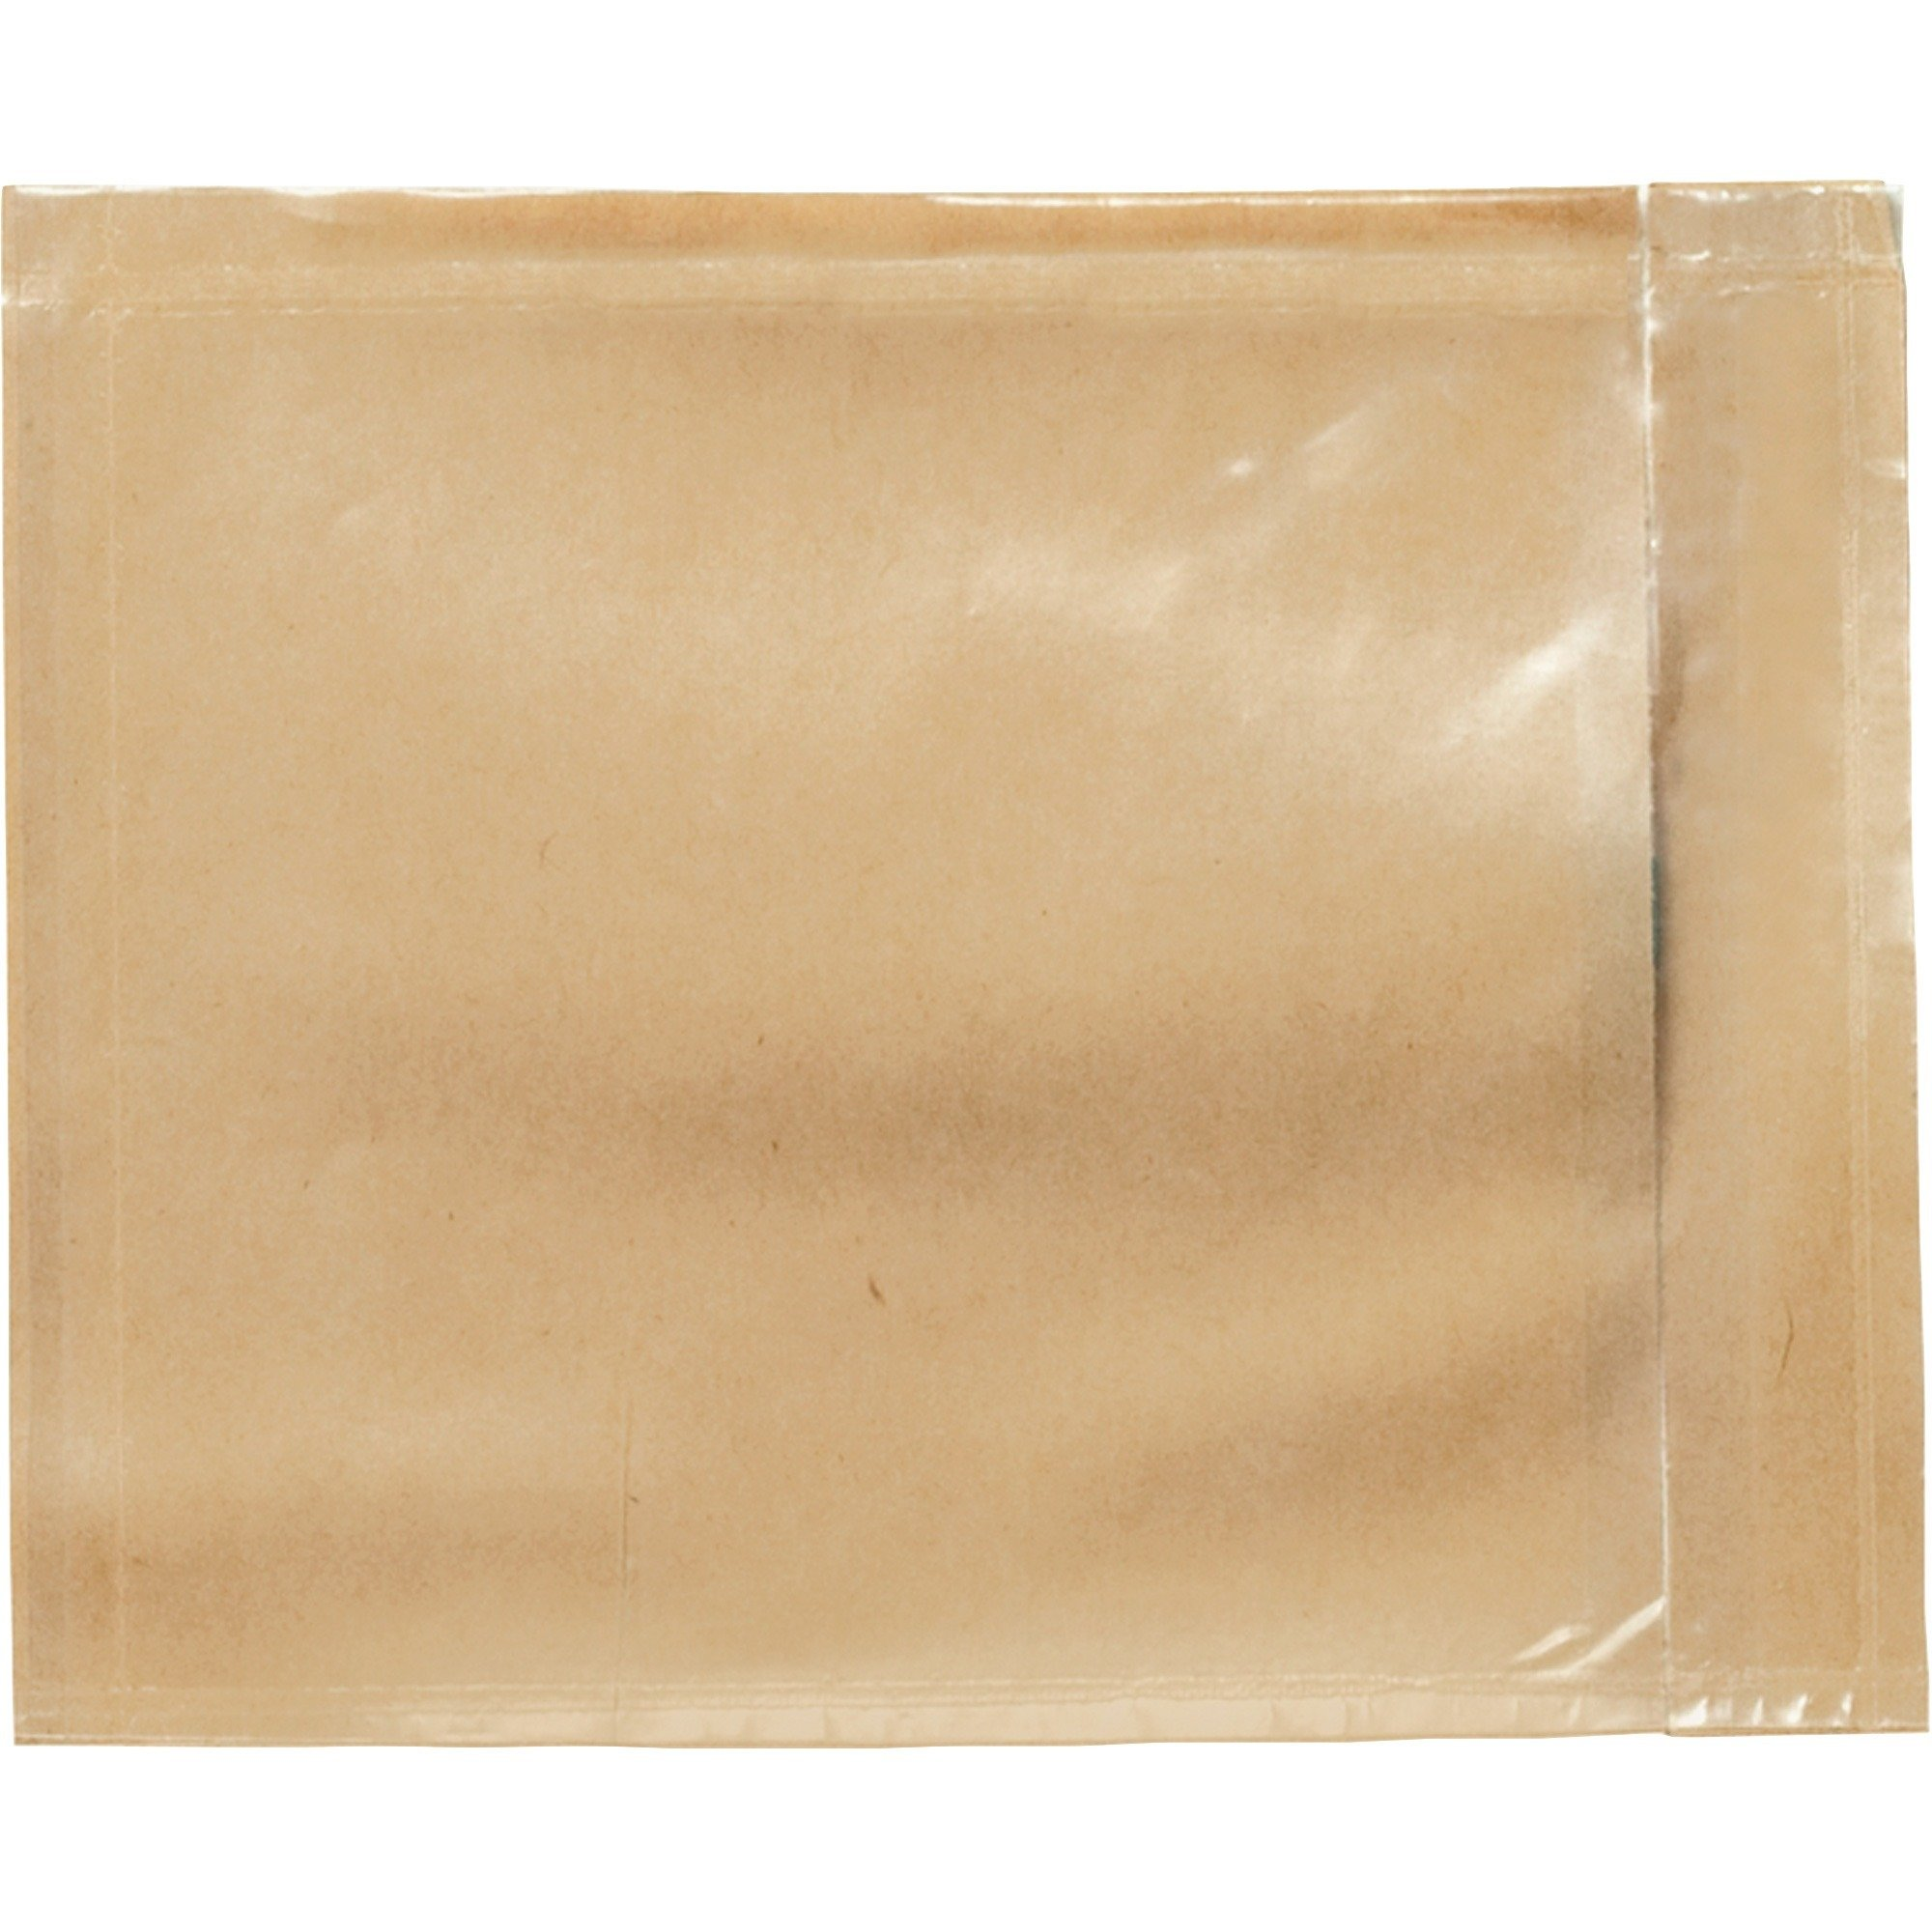 3M Plain Back Loading Packing List Envelope, 5-1/2 x 4-1/2, 1000/Box (NP1)